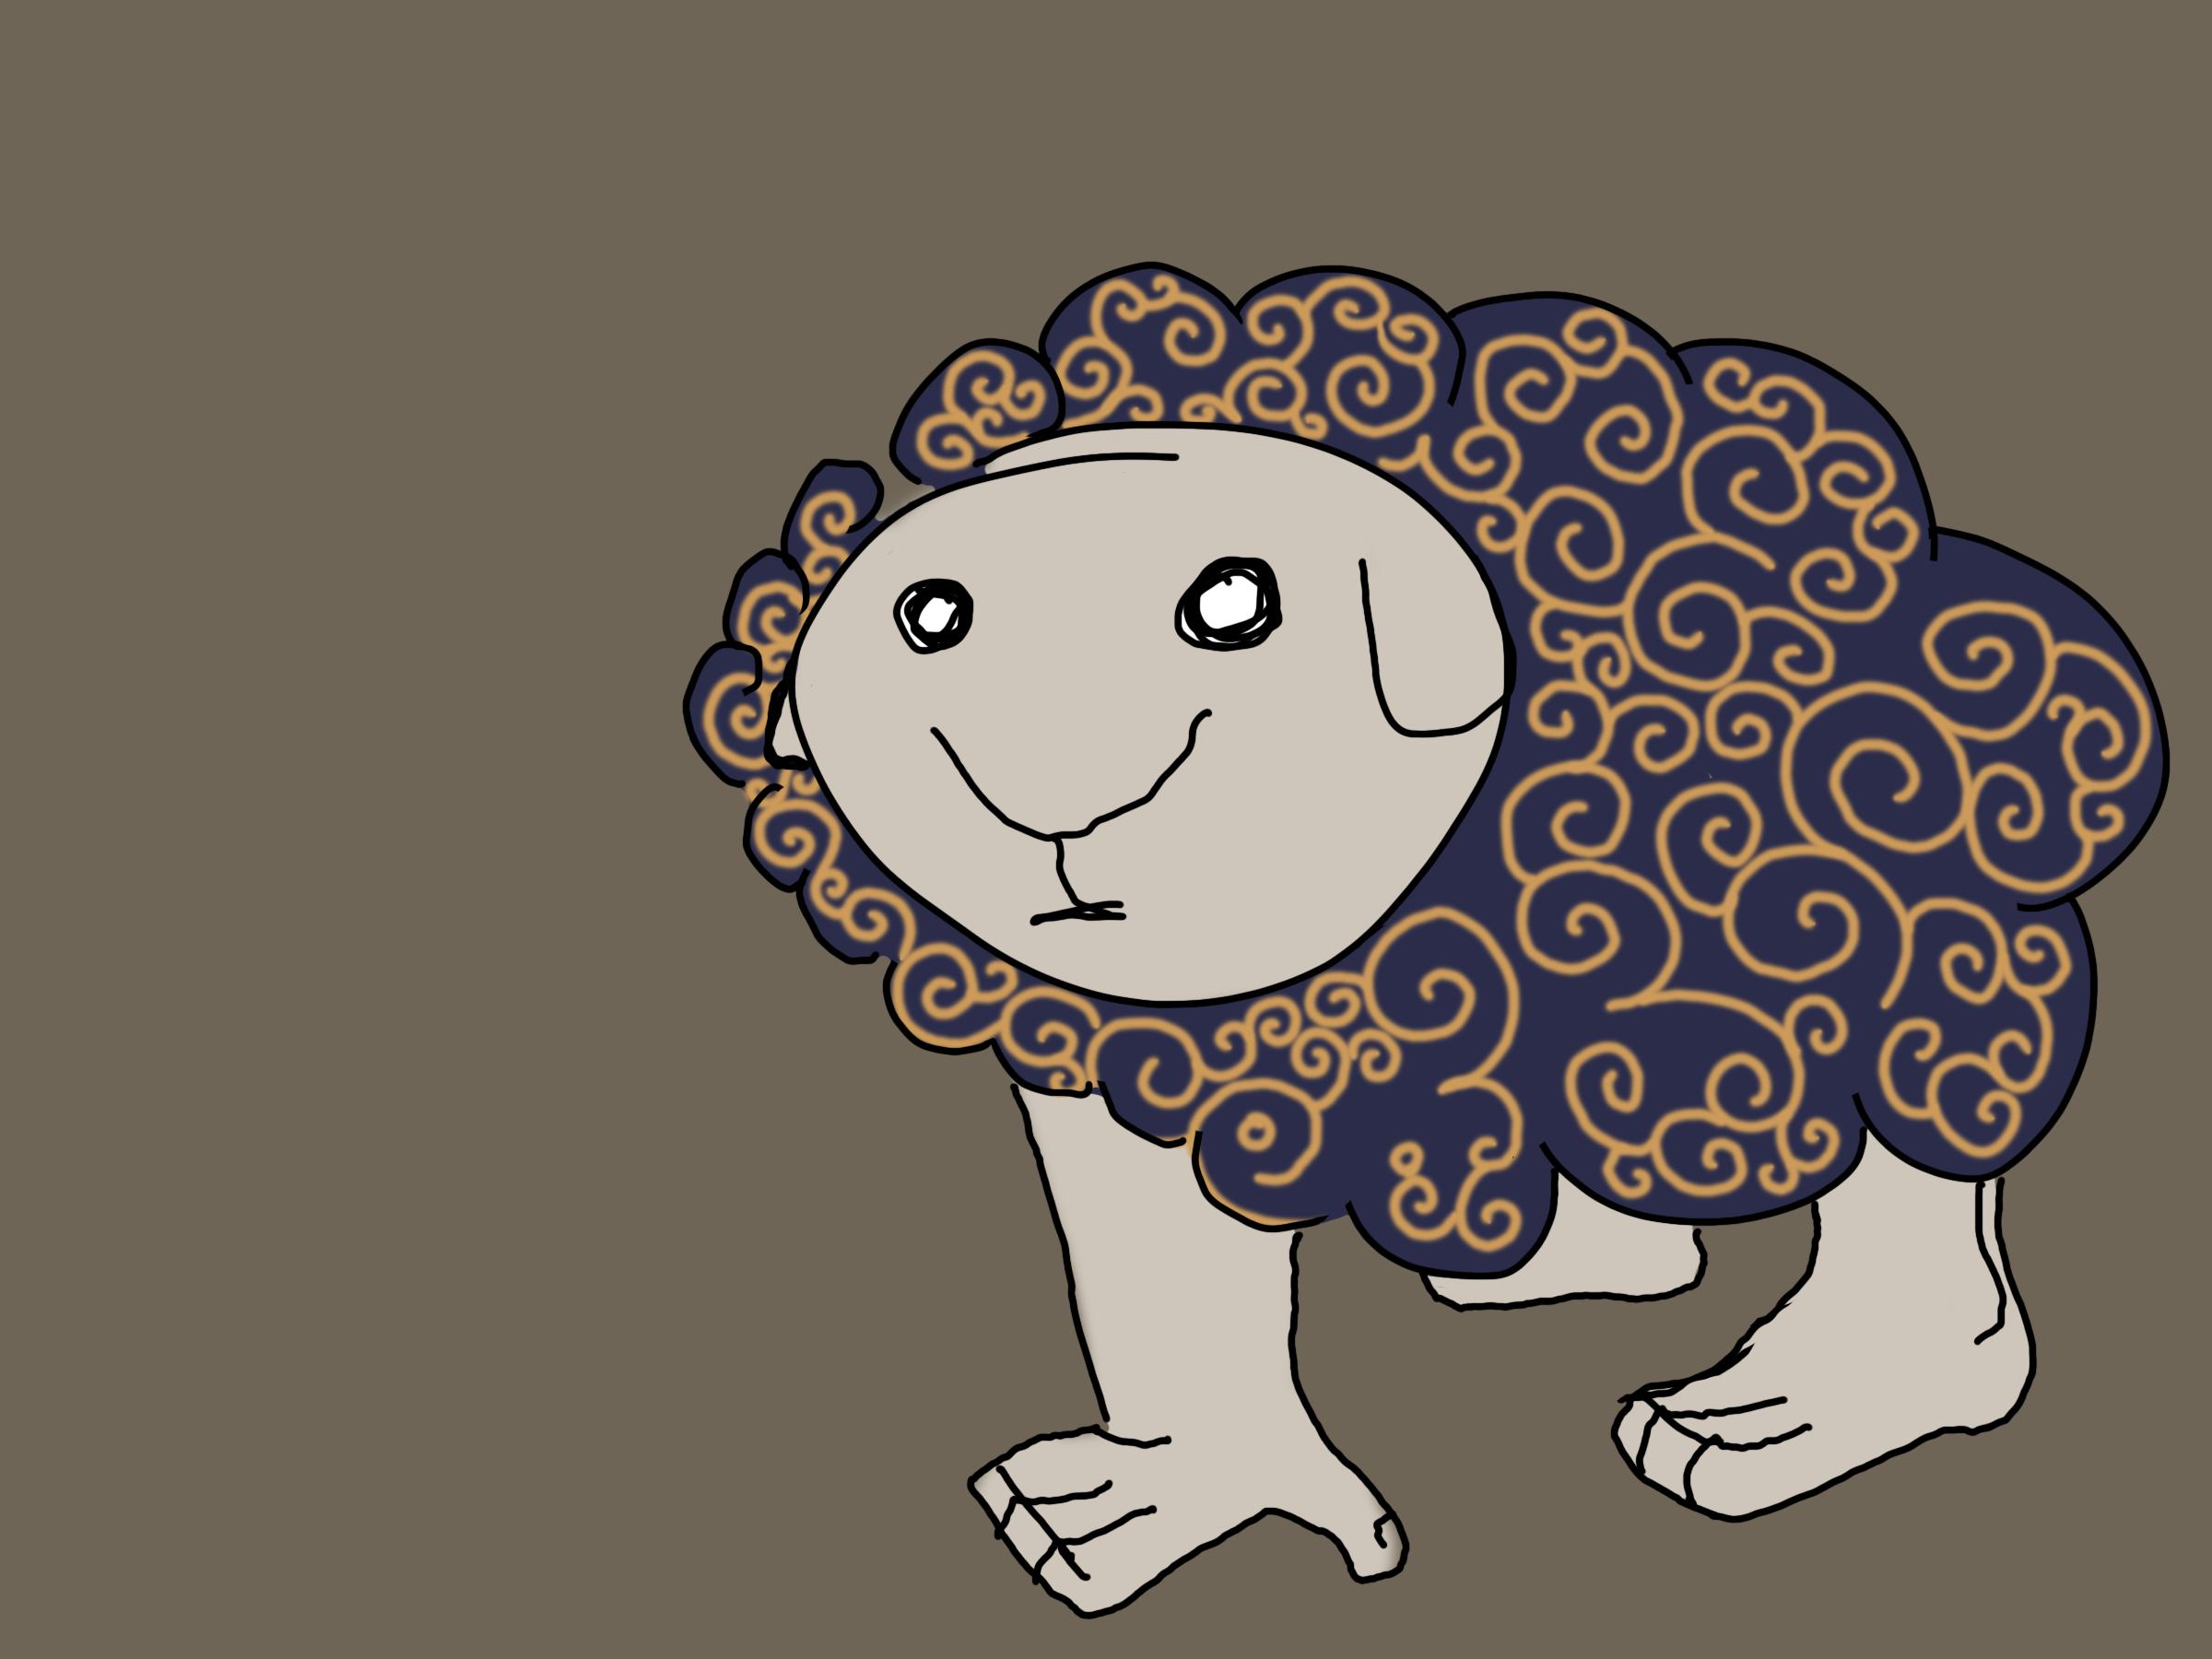 Creepy Sheepy